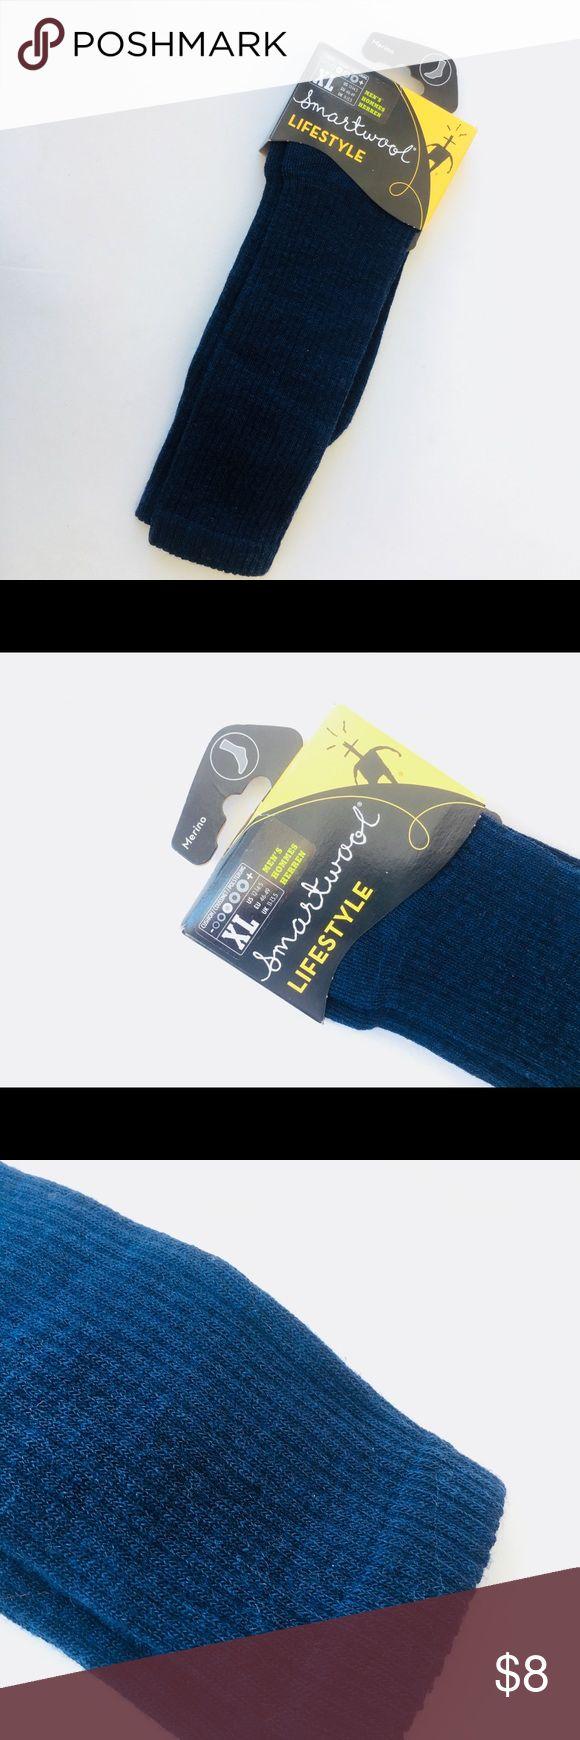 New! Men's SmartWool Merino Socks, XL New with Tags! Men's SmartWool Lifestyle Merino Navy Socks in XL (12-14.5) Navy, Ribbed Smartwool Underwear & Socks Casual Socks